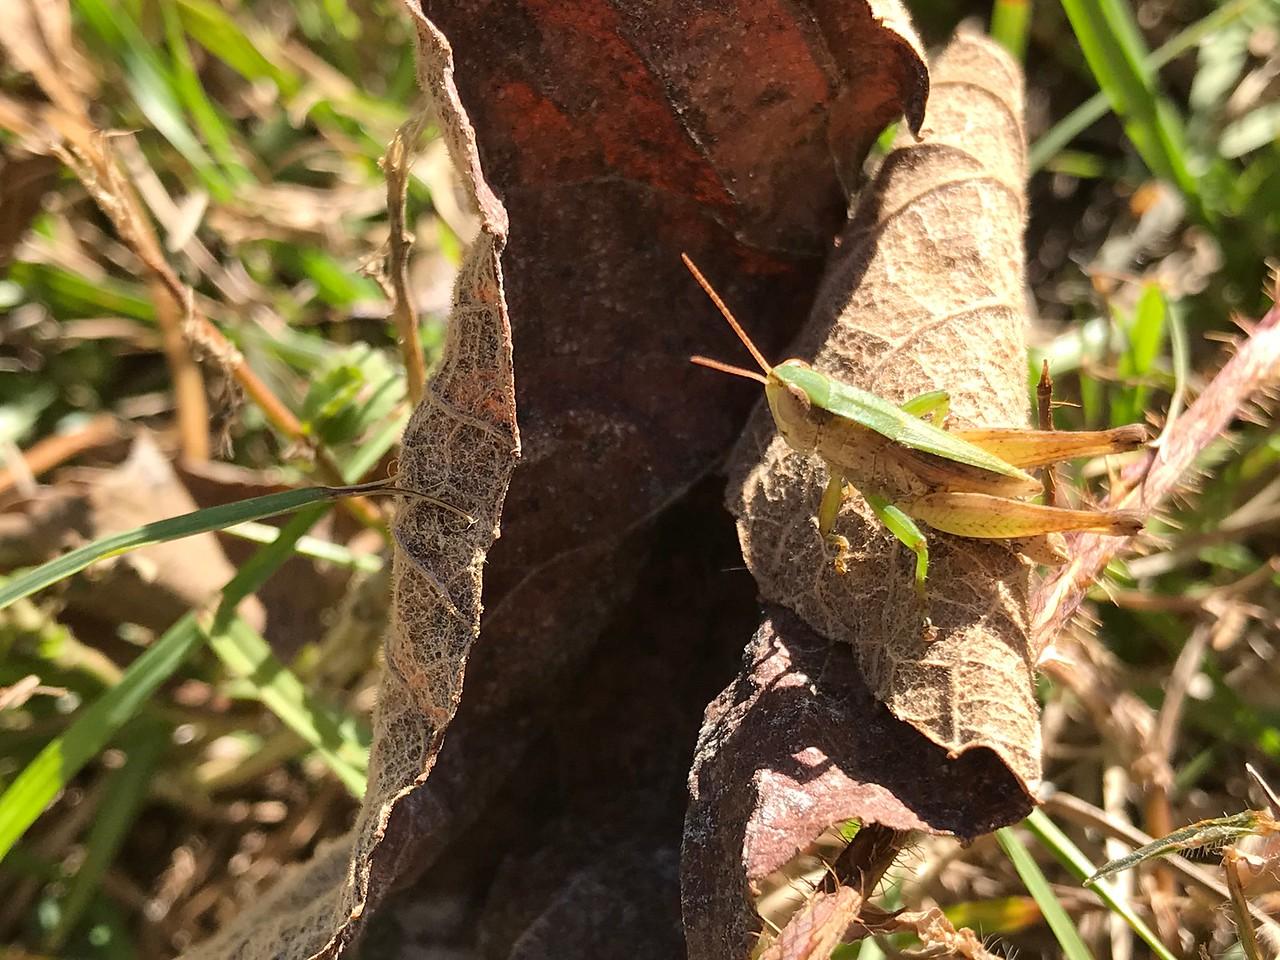 Photogenic & agreeable Louisiana wetlands grasshopper